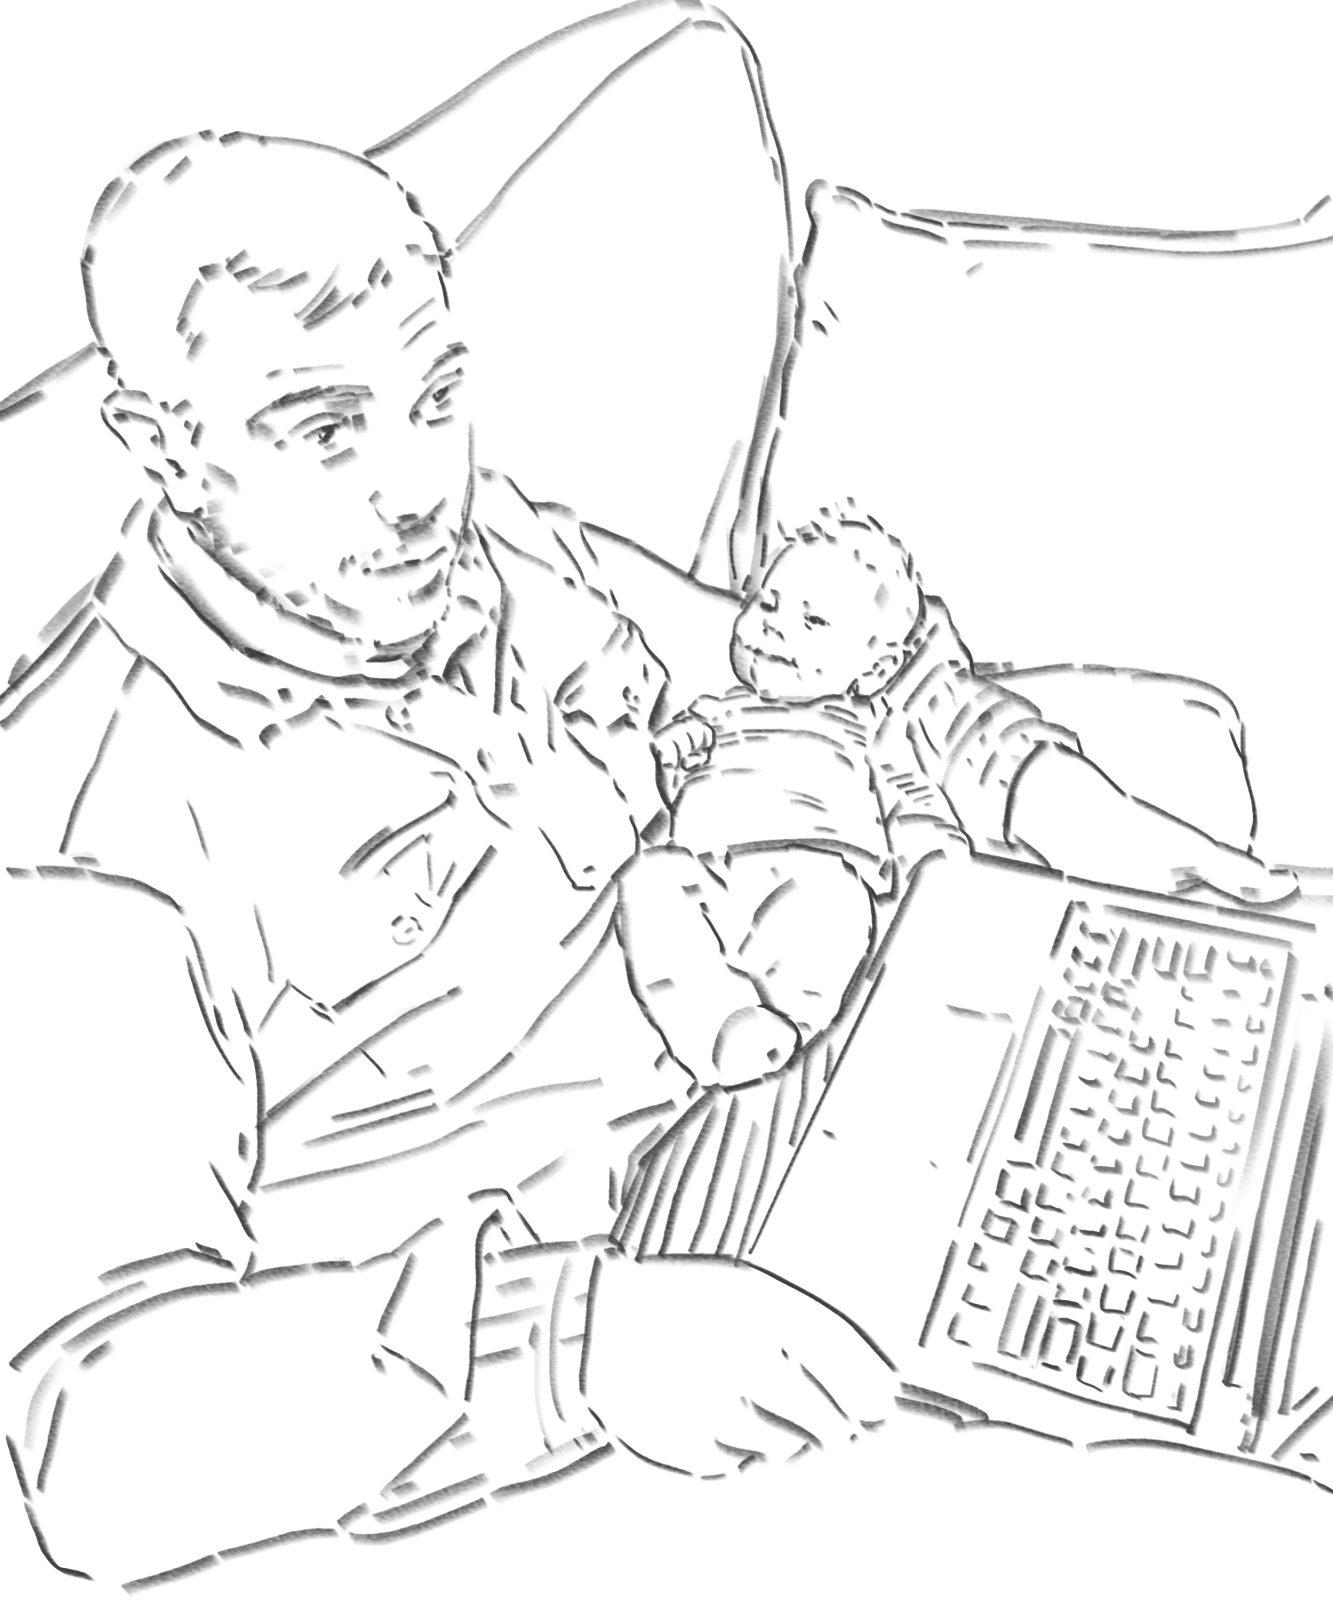 Sing me to sleep, daddy - digital drawing by Olimpia Hinamatsuri Barbu